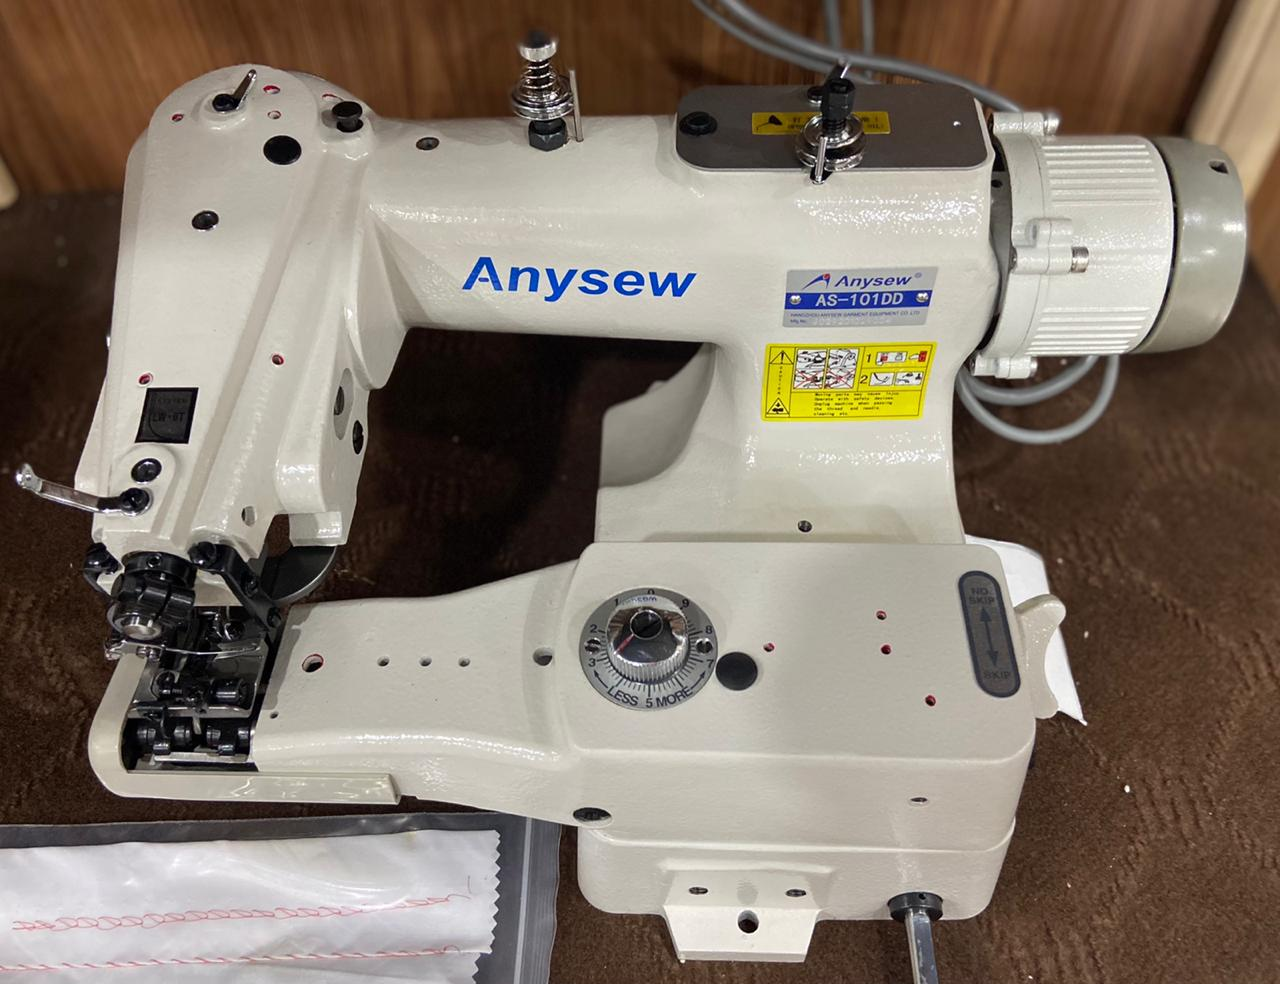 Anysew Direct Drive Blind Stitch Machine AS-101